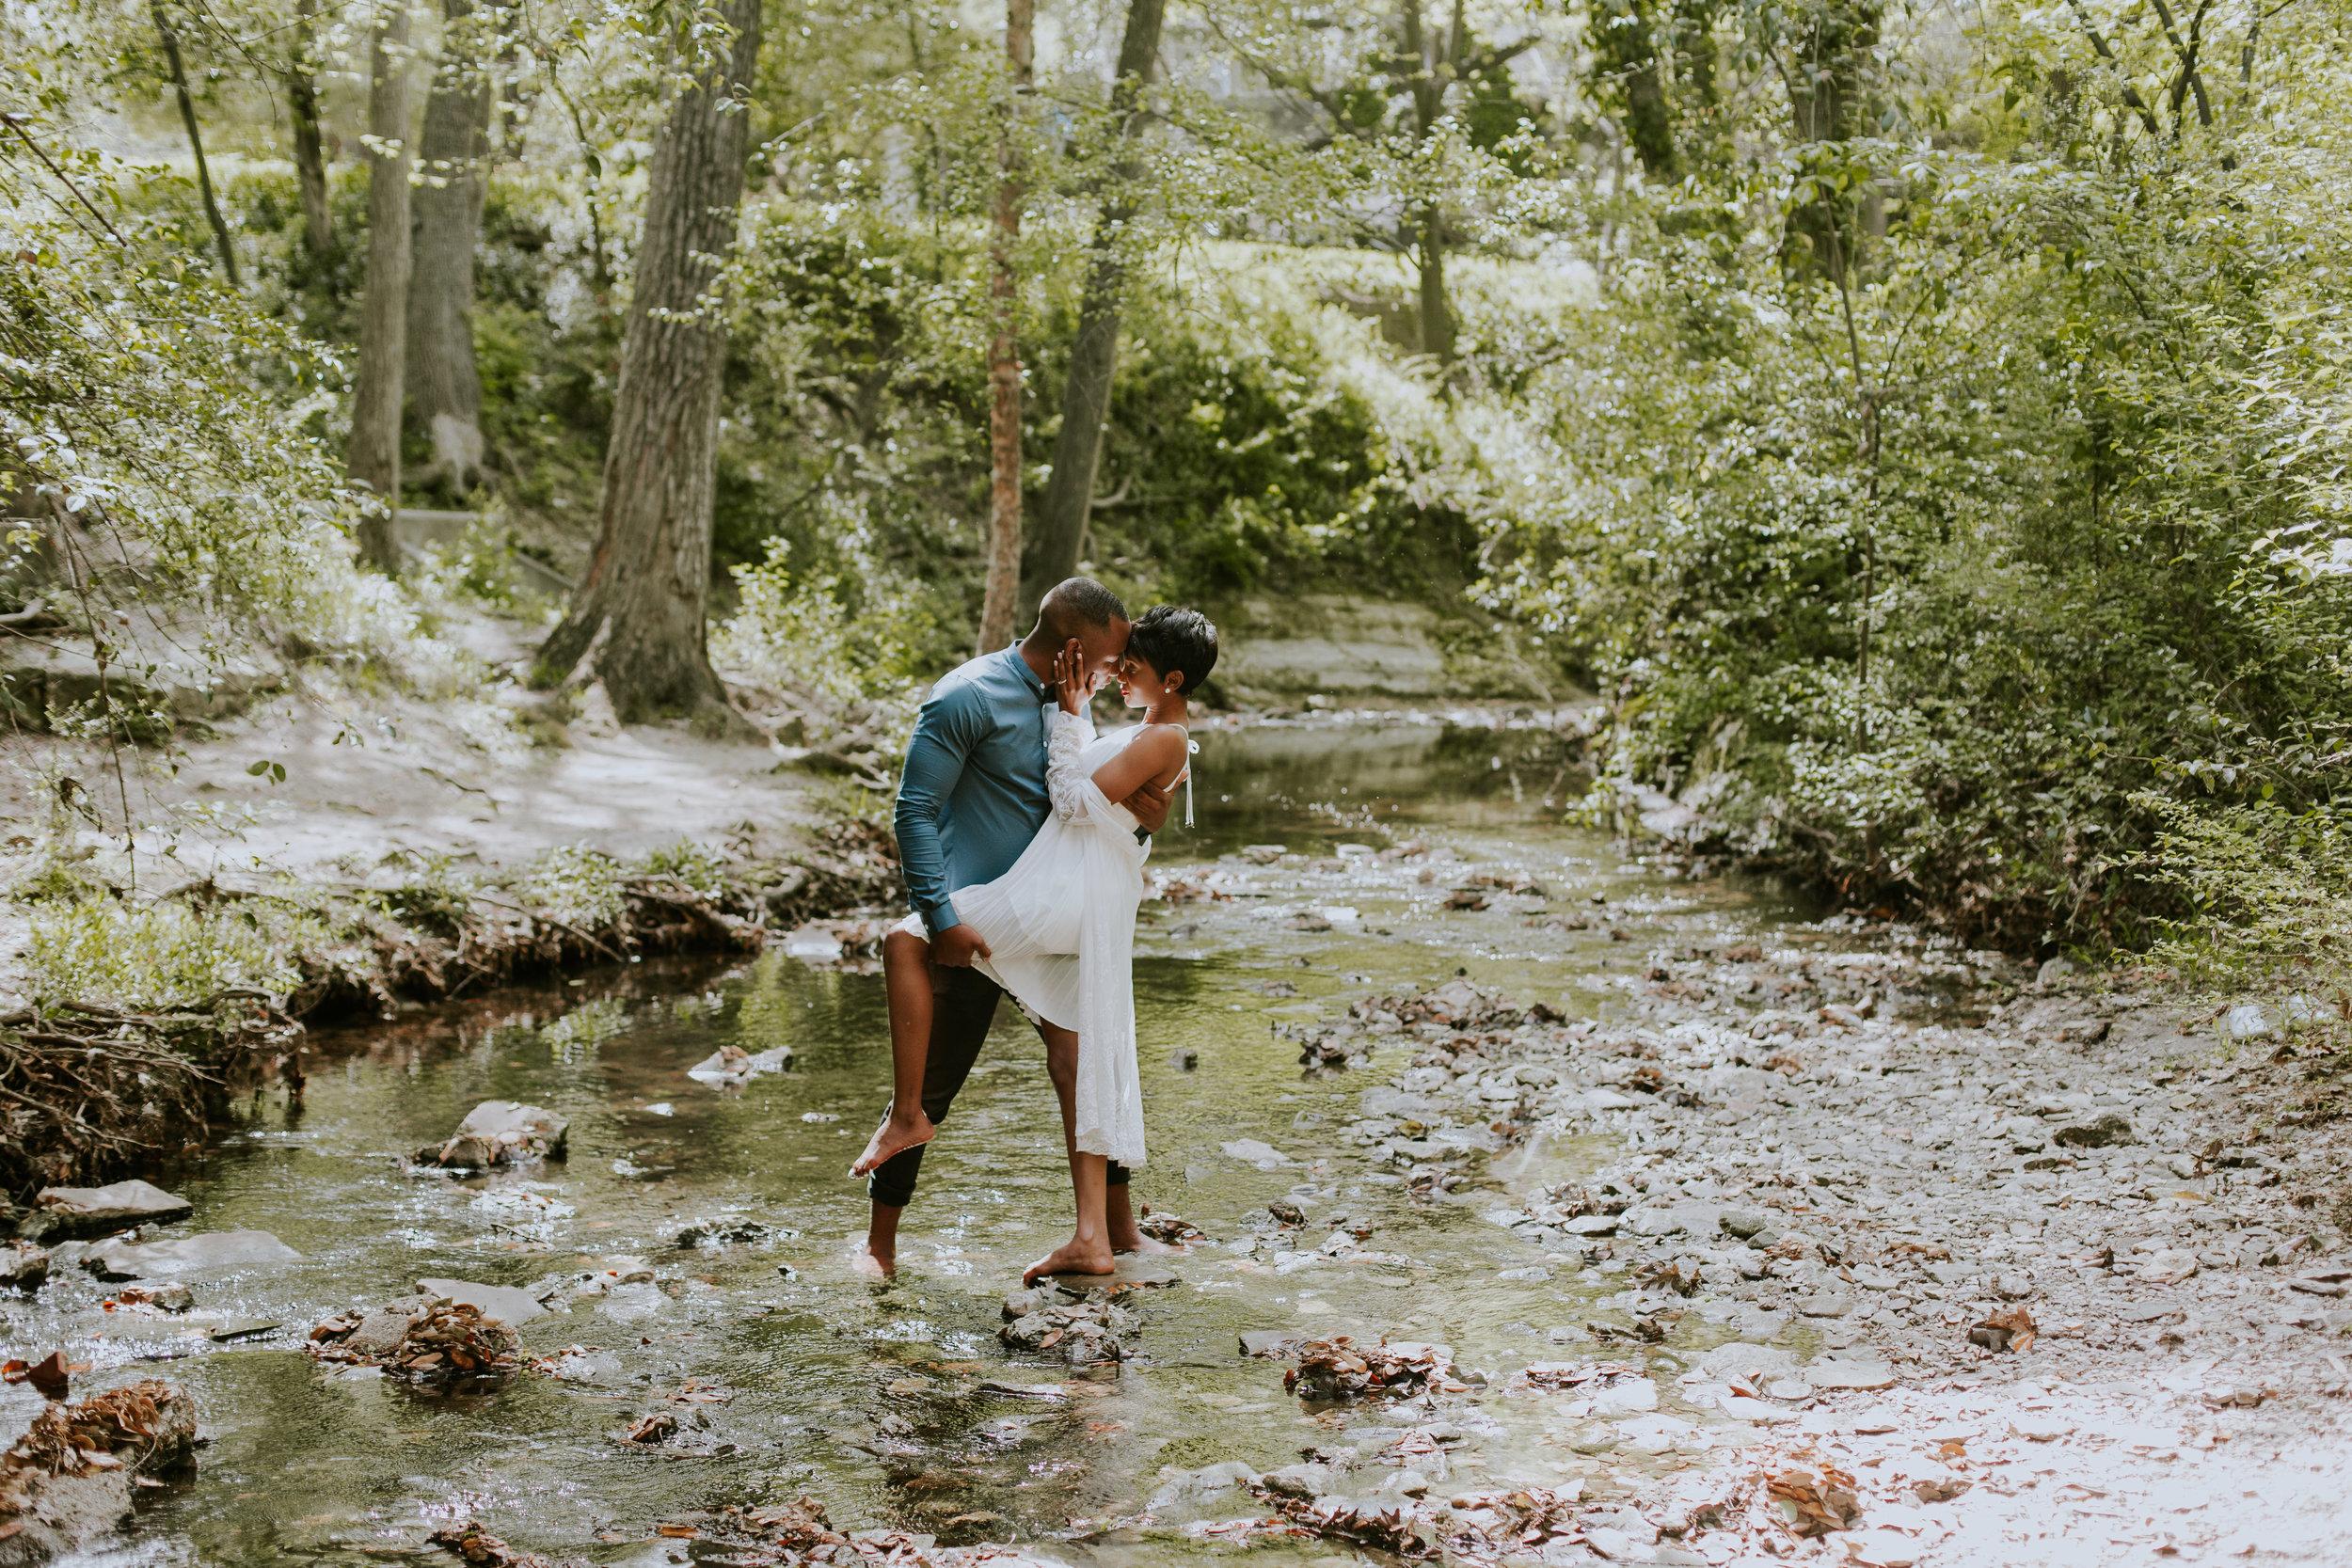 MICHAEL + BRITTIN - April 5th, 2018